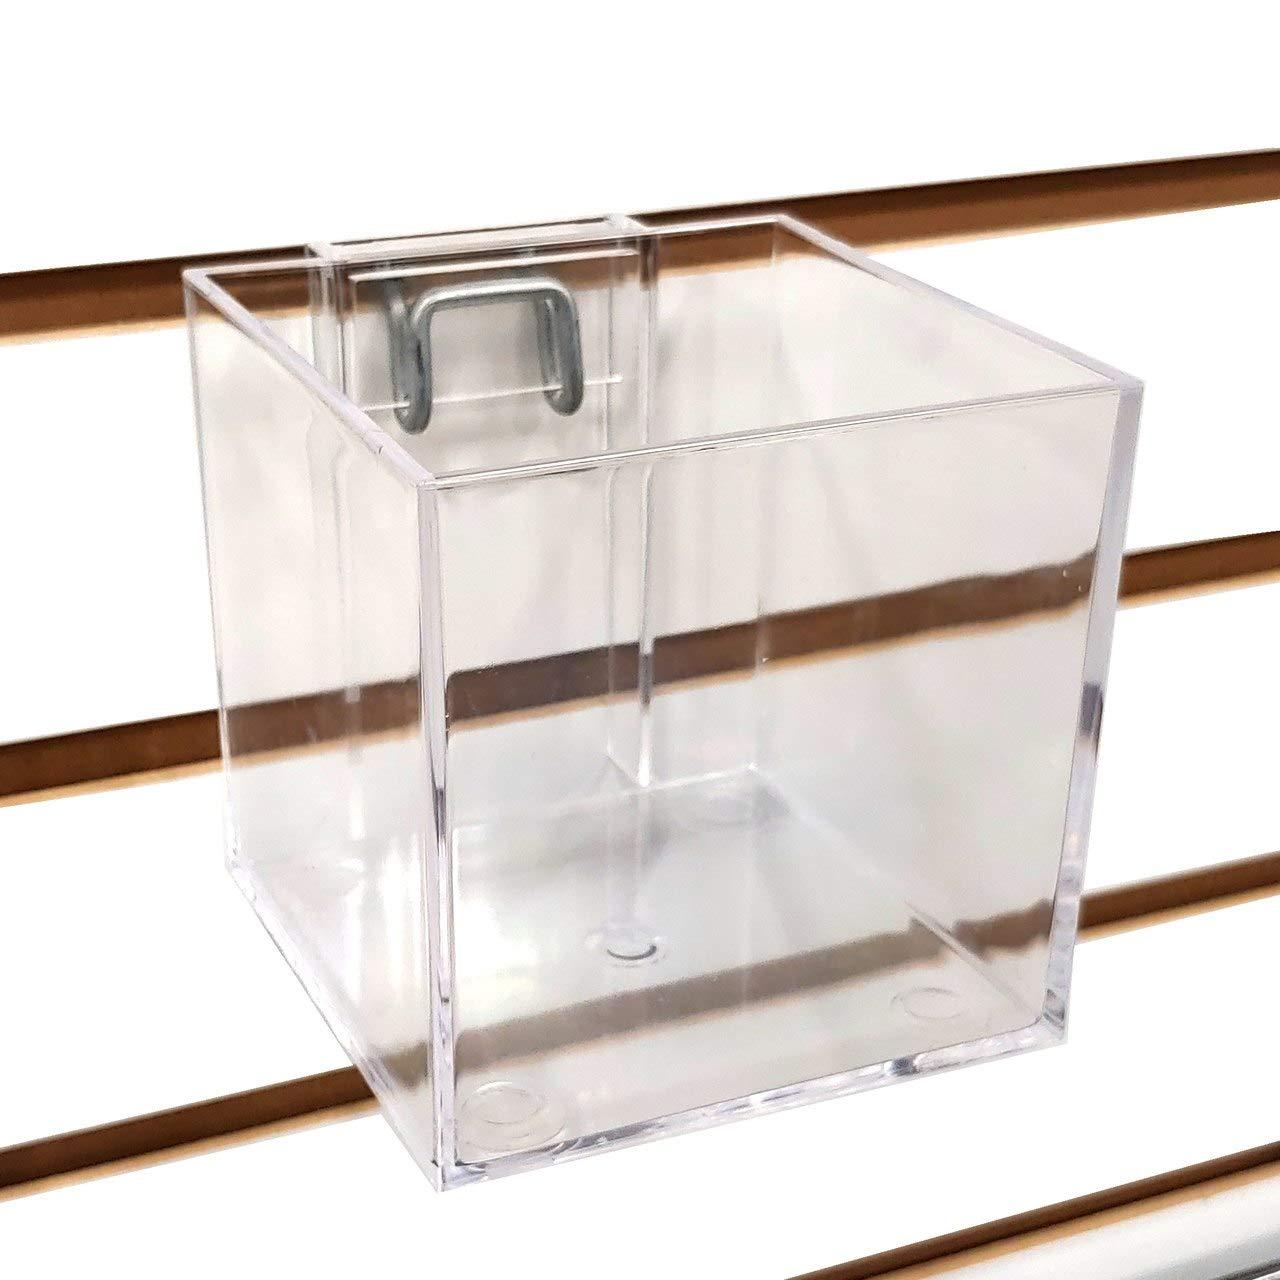 Slatwall & Pegboard 4'' Clear Acrylic Cube Dump Bin Display, 5 Pack